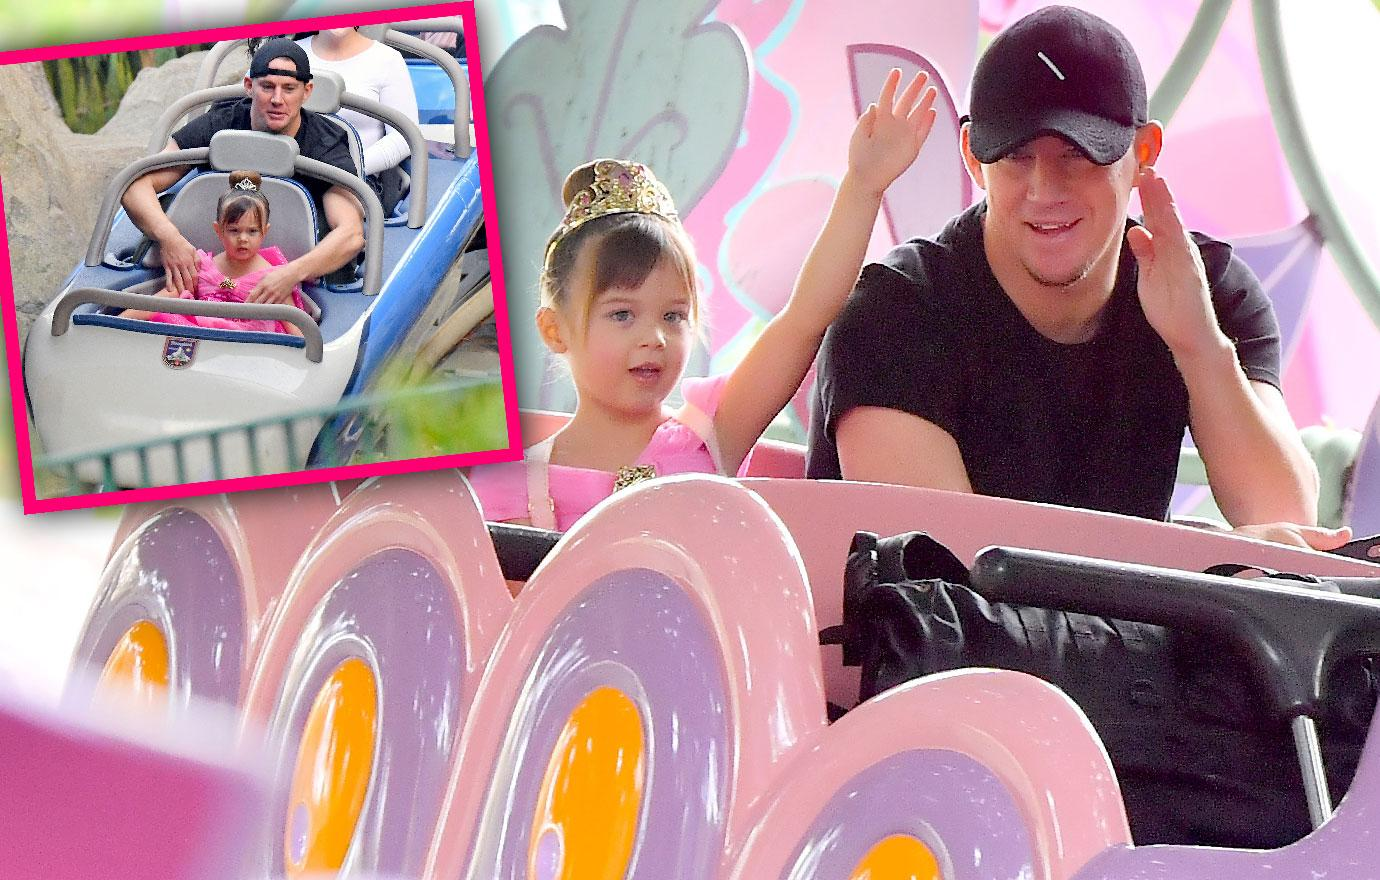 Divorcing Channing Tatum Visits Disneyland With Daughter